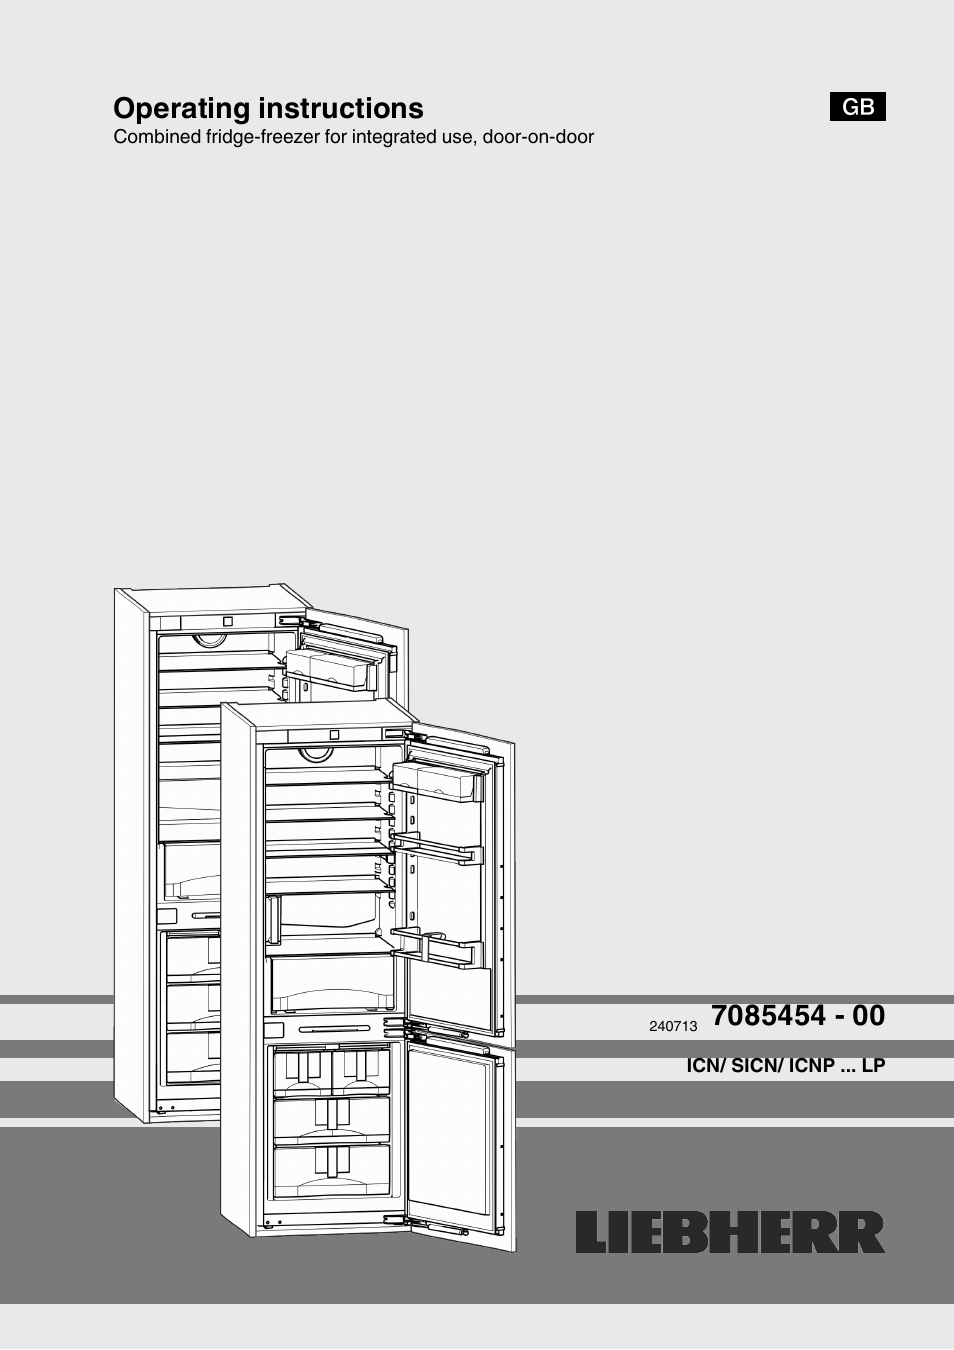 Liebherr Icn 3366 Premium Nofrost User Manual 12 Pages